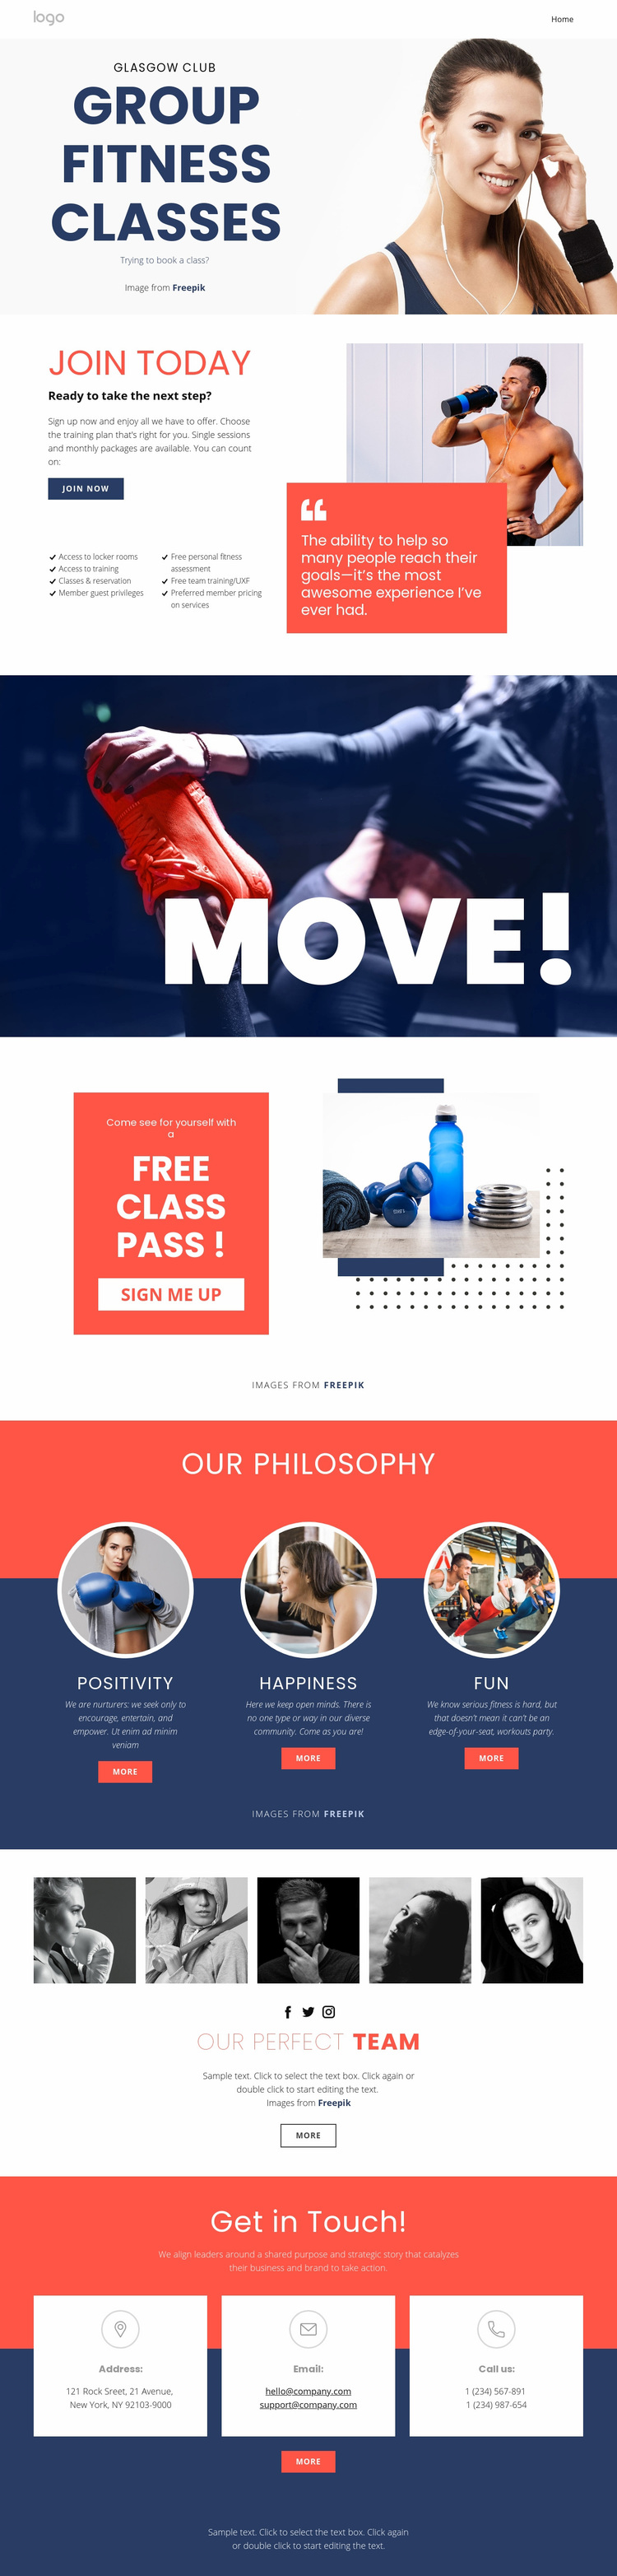 Fitness studio Web Page Designer